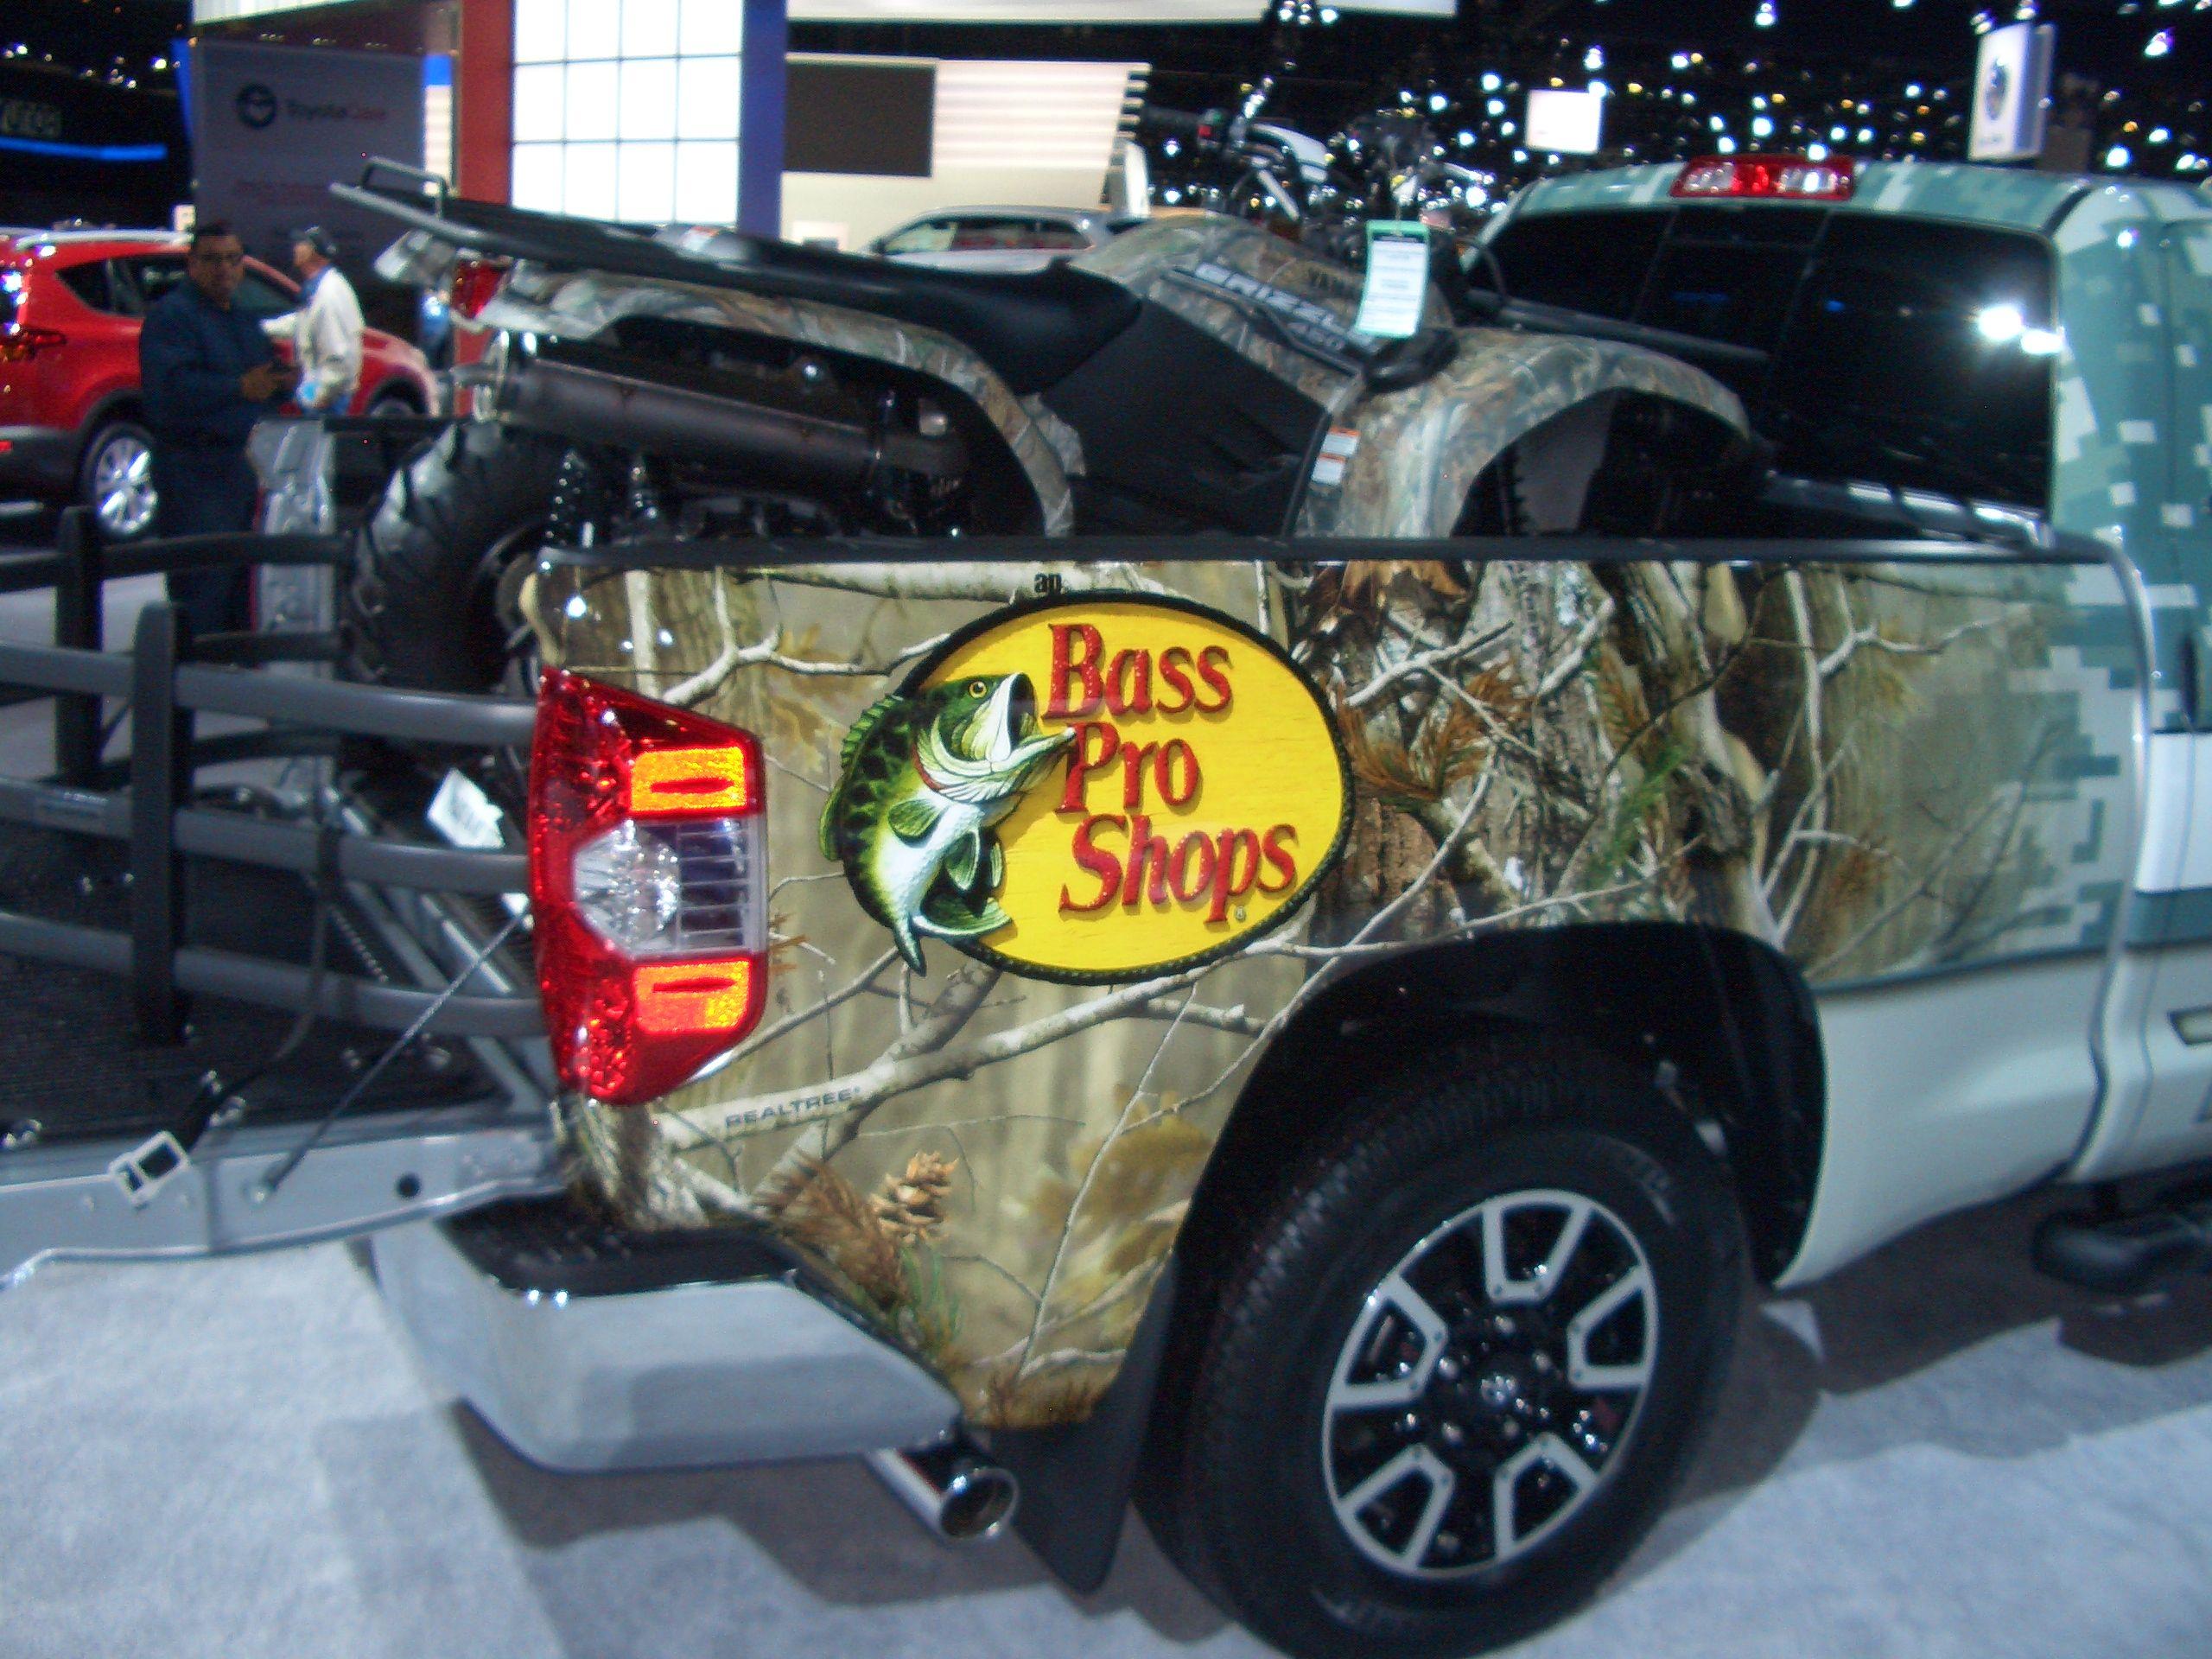 Toyota Tundra With Bass Pro Shops USA Pinterest Toyota Tundra - Bass pro car show